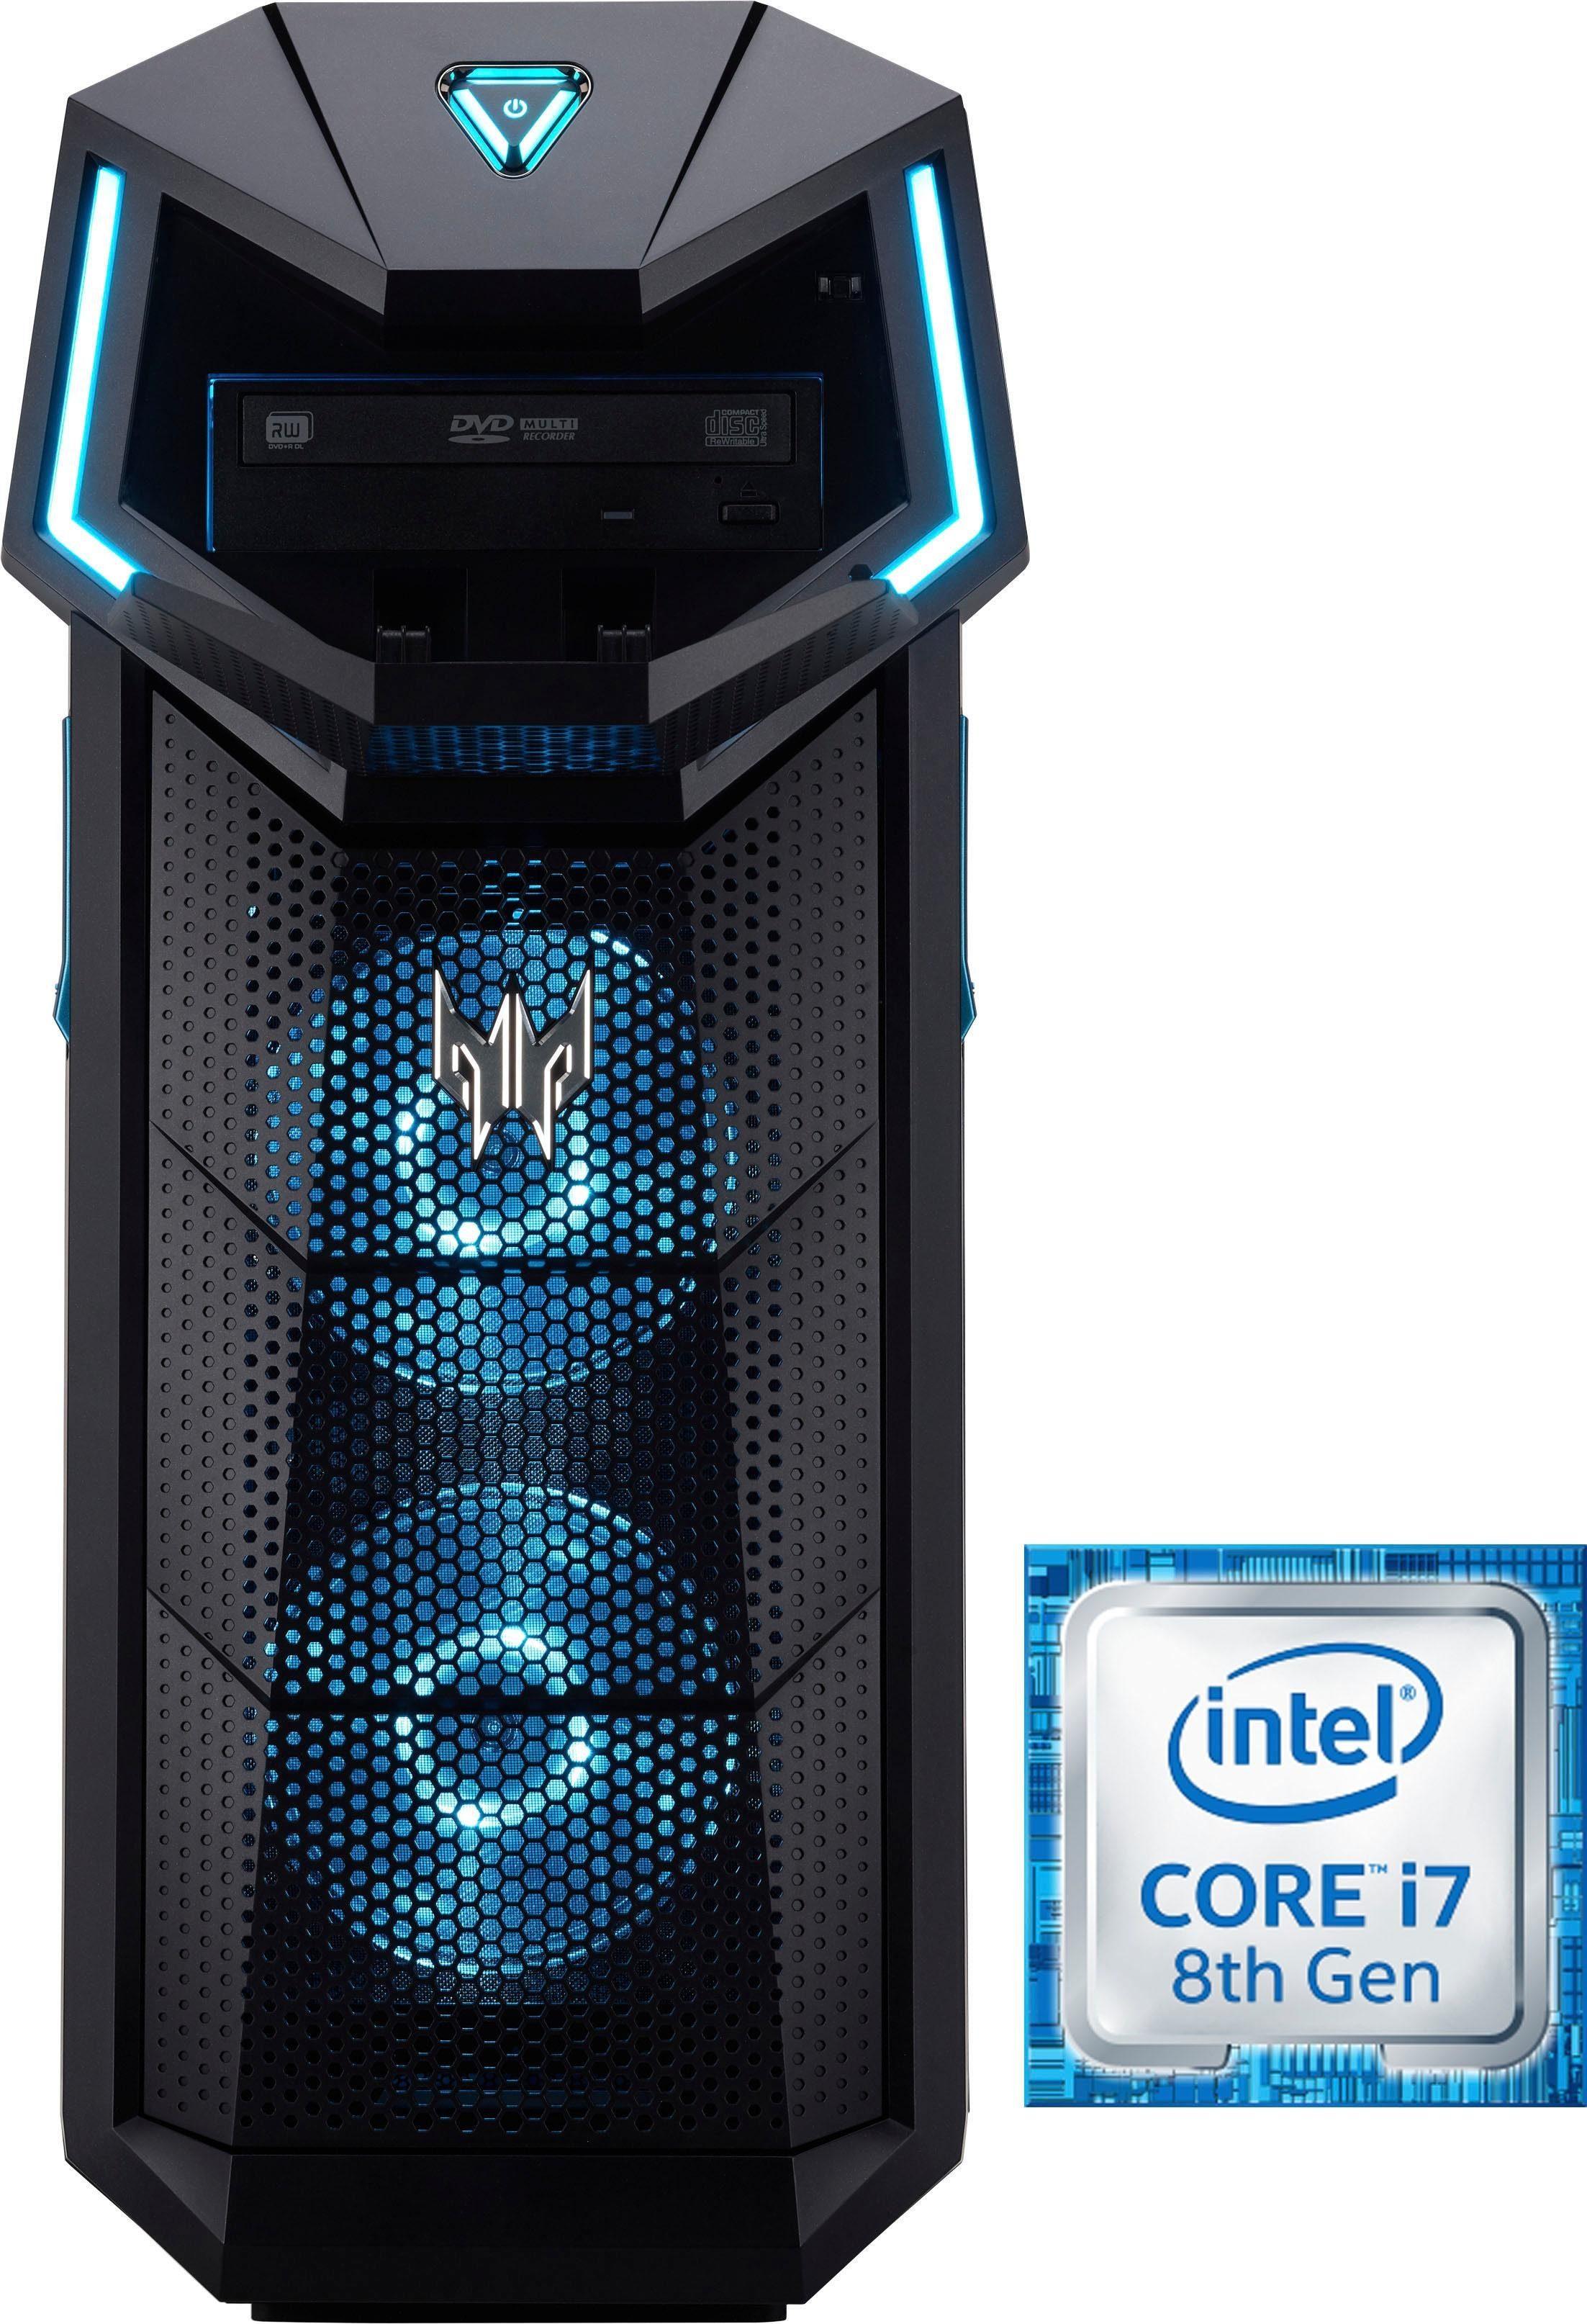 Acer Predator Orion 5000 DG.E0SEG.011 Gaming-PC (Core i7, GTX 1070 Ti, 16 GB RAM, 1000 GB HDD, 128 GB SSD)